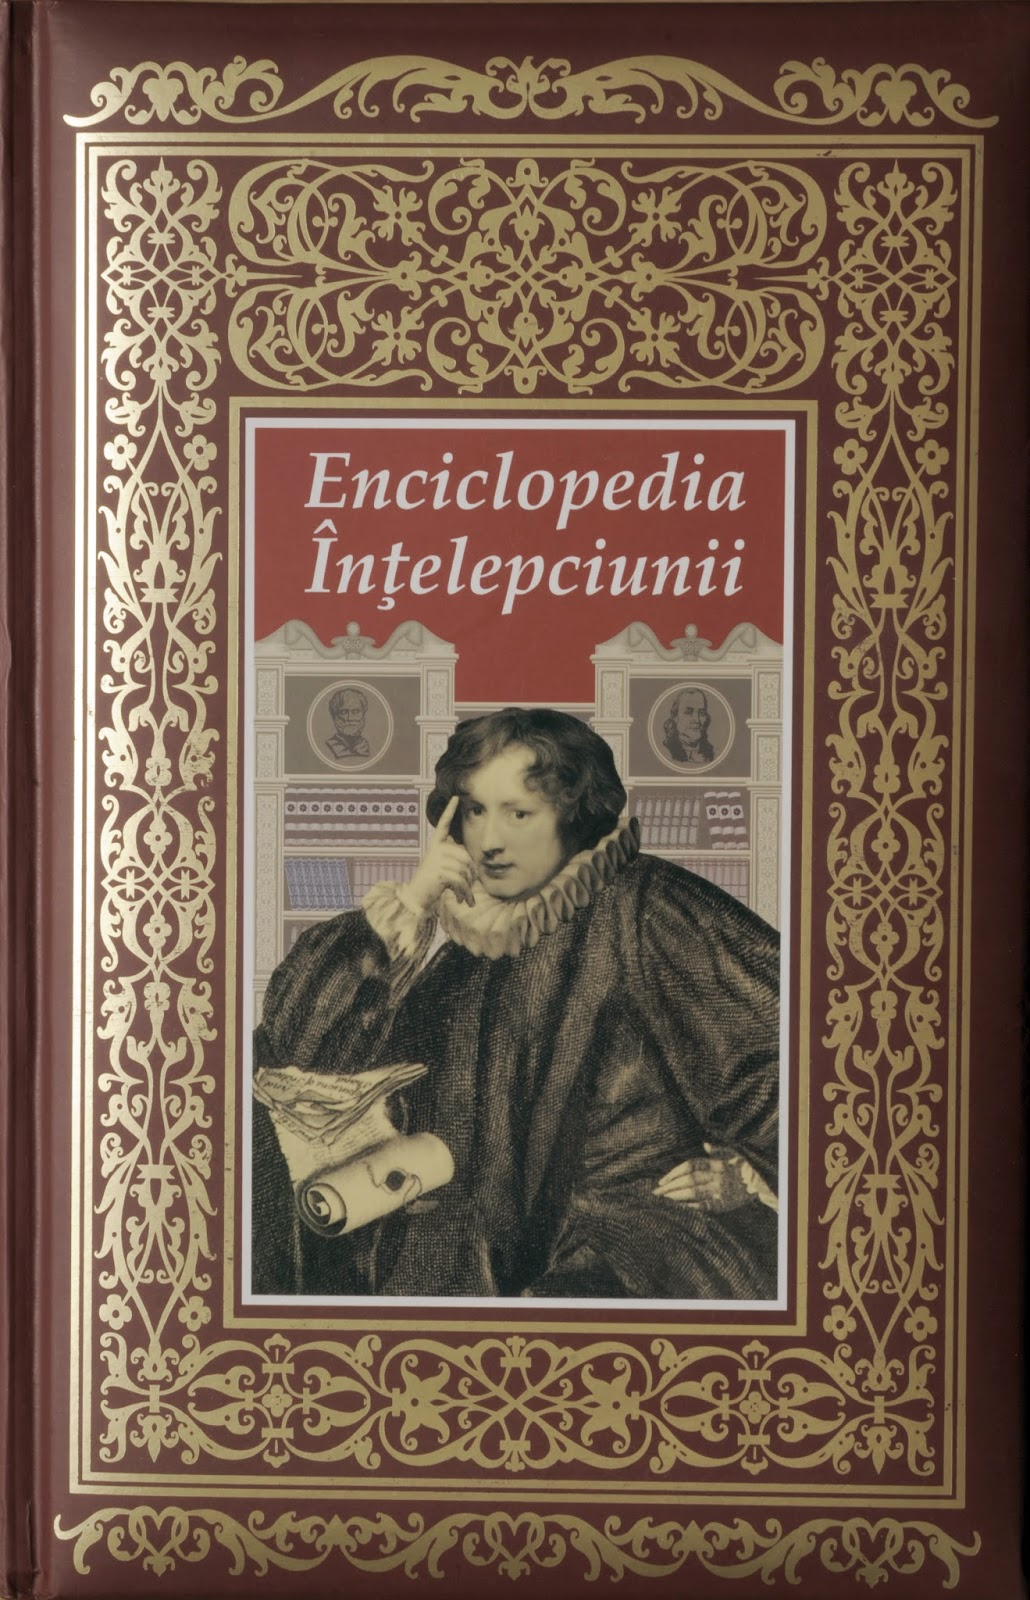 Enciclopedia Intelepciunii - Editura Roossa